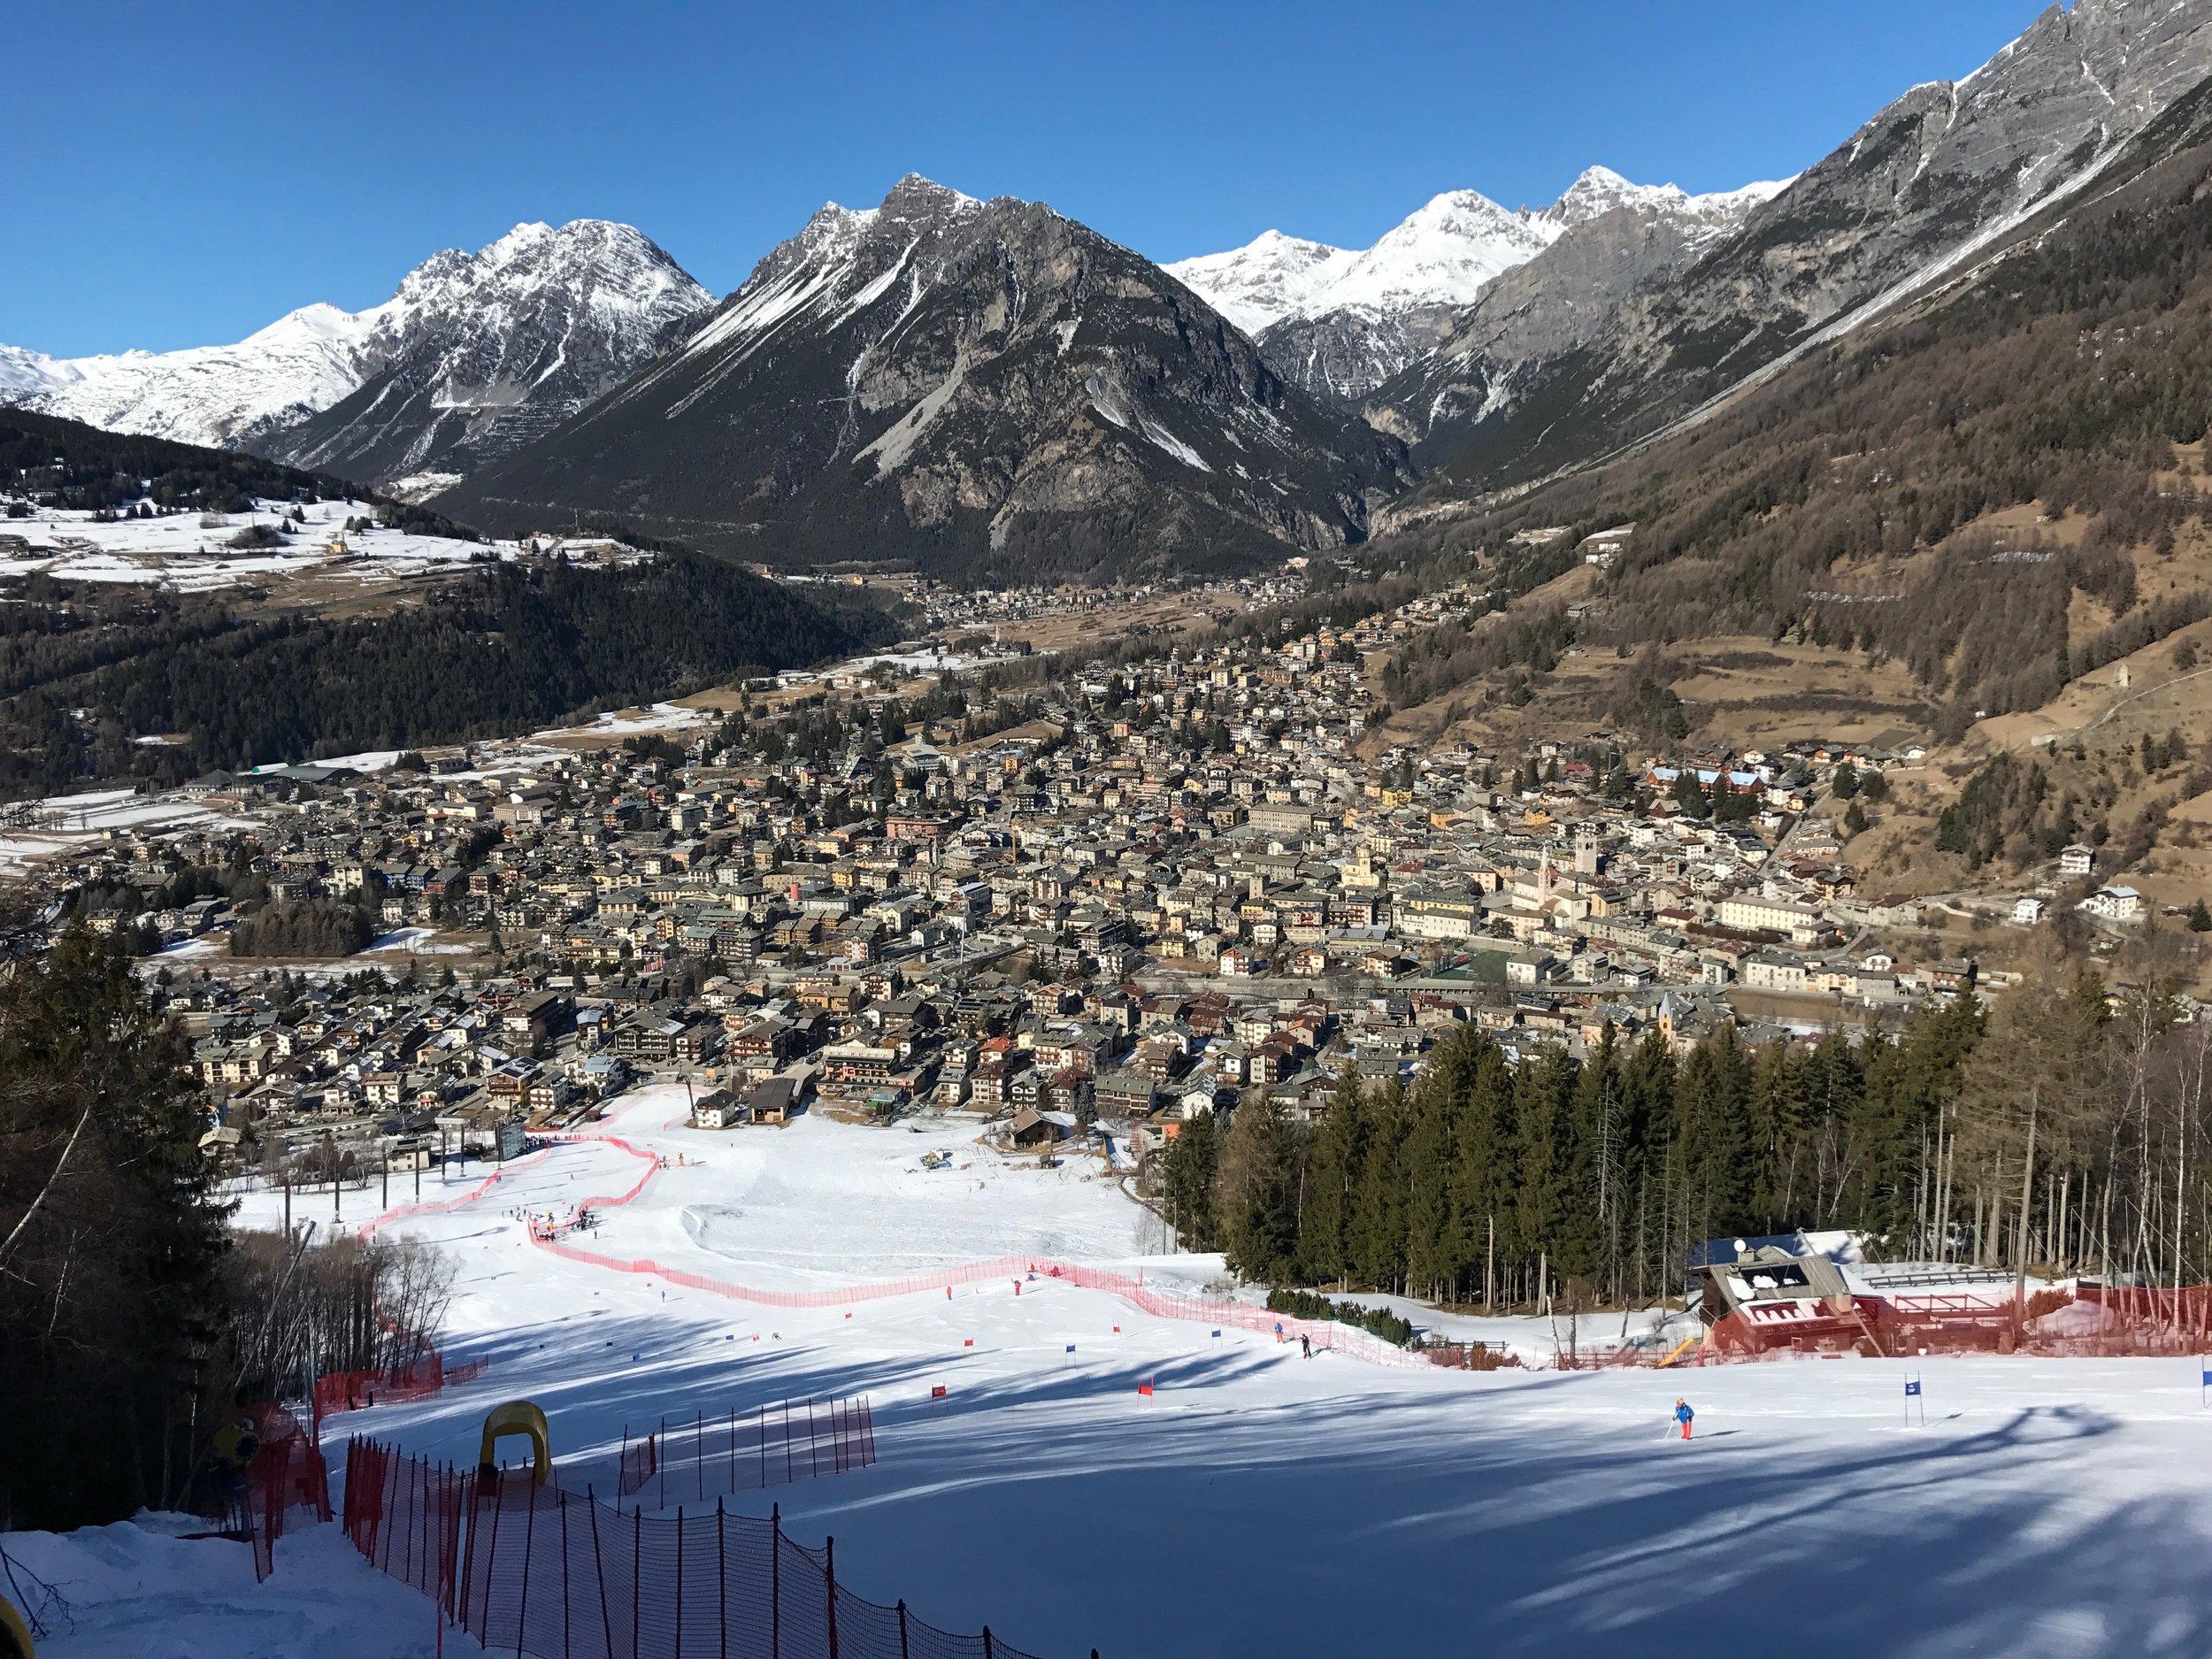 Bormio SG piste  Race entries can be made through Snowsport England  https://snowsportengland.org.uk/node/355